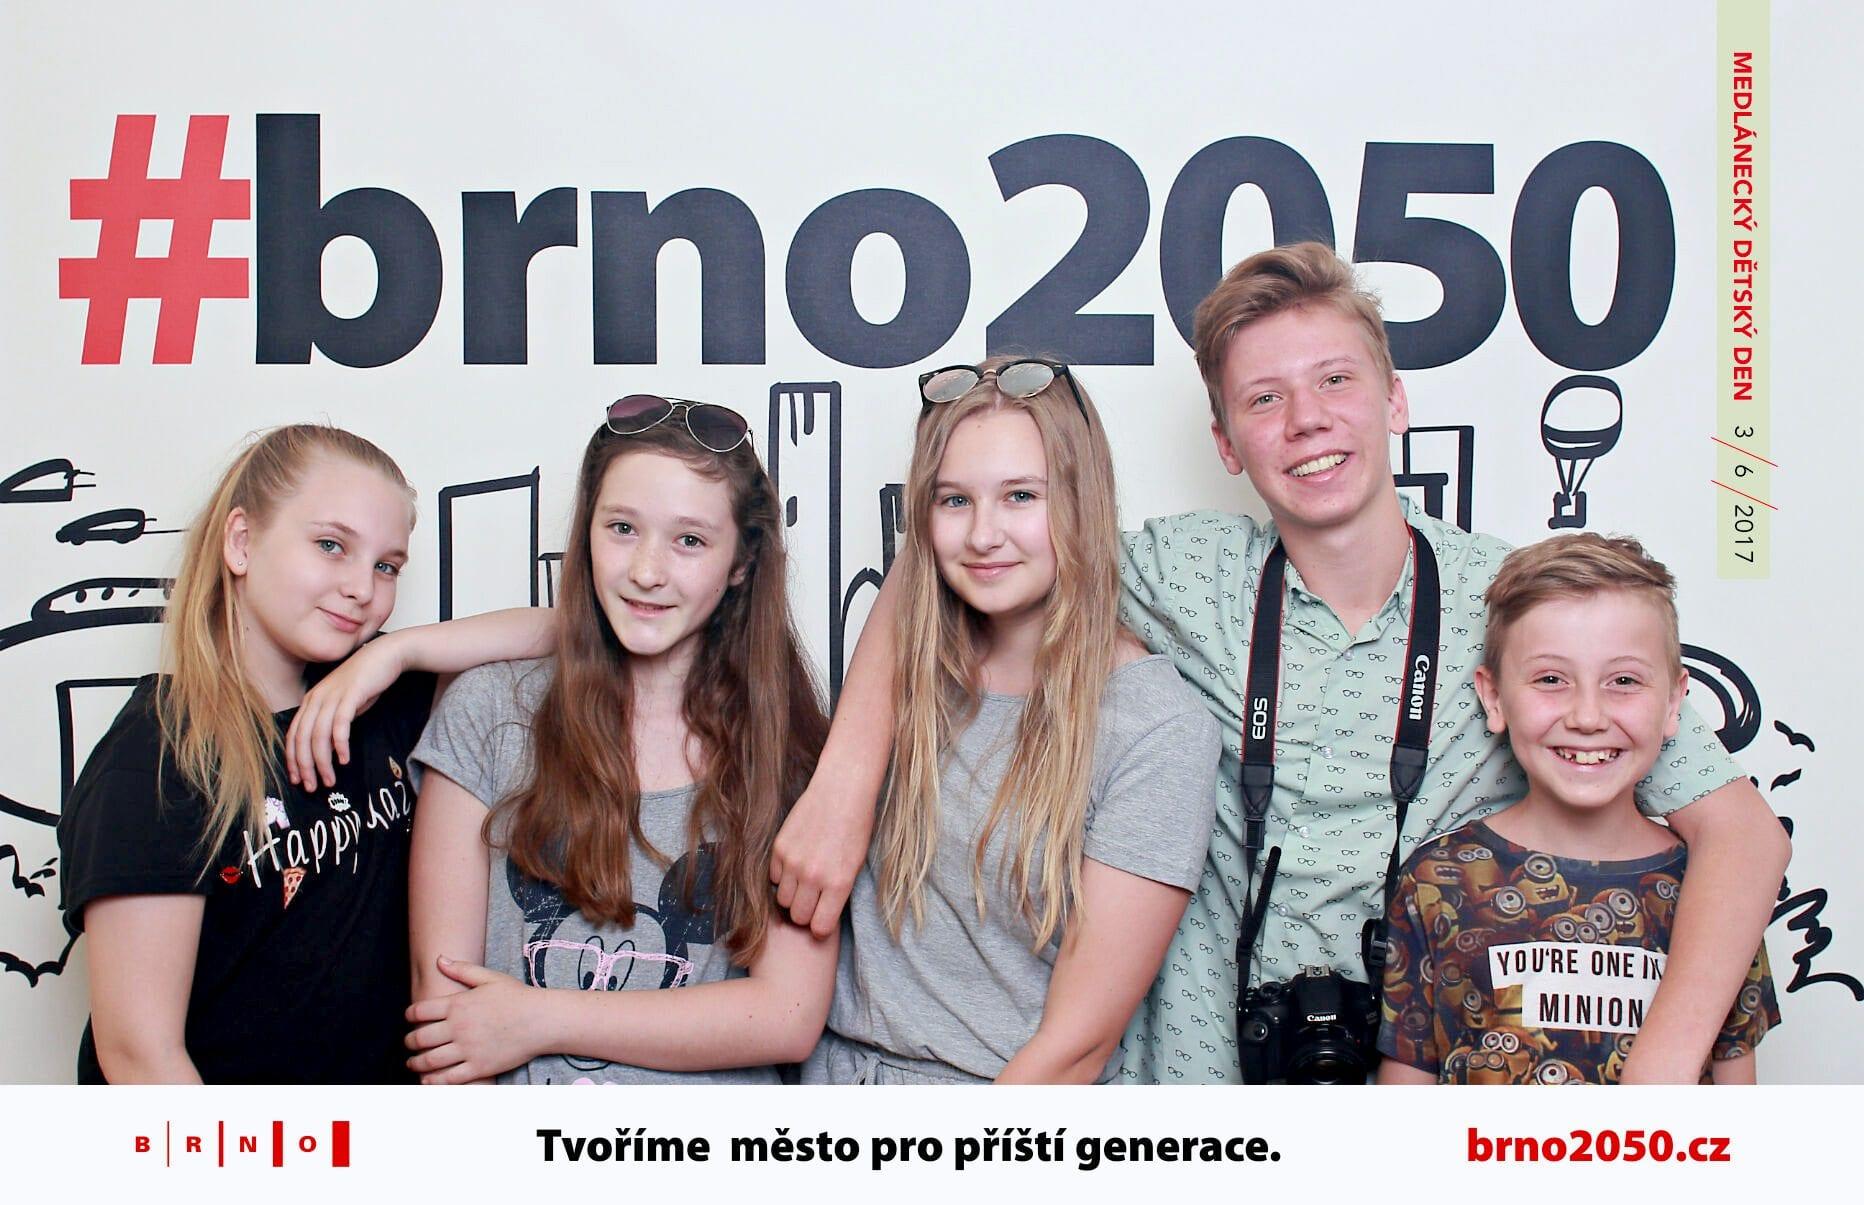 fotokoutek-brno-2050-3-6-2017-257609